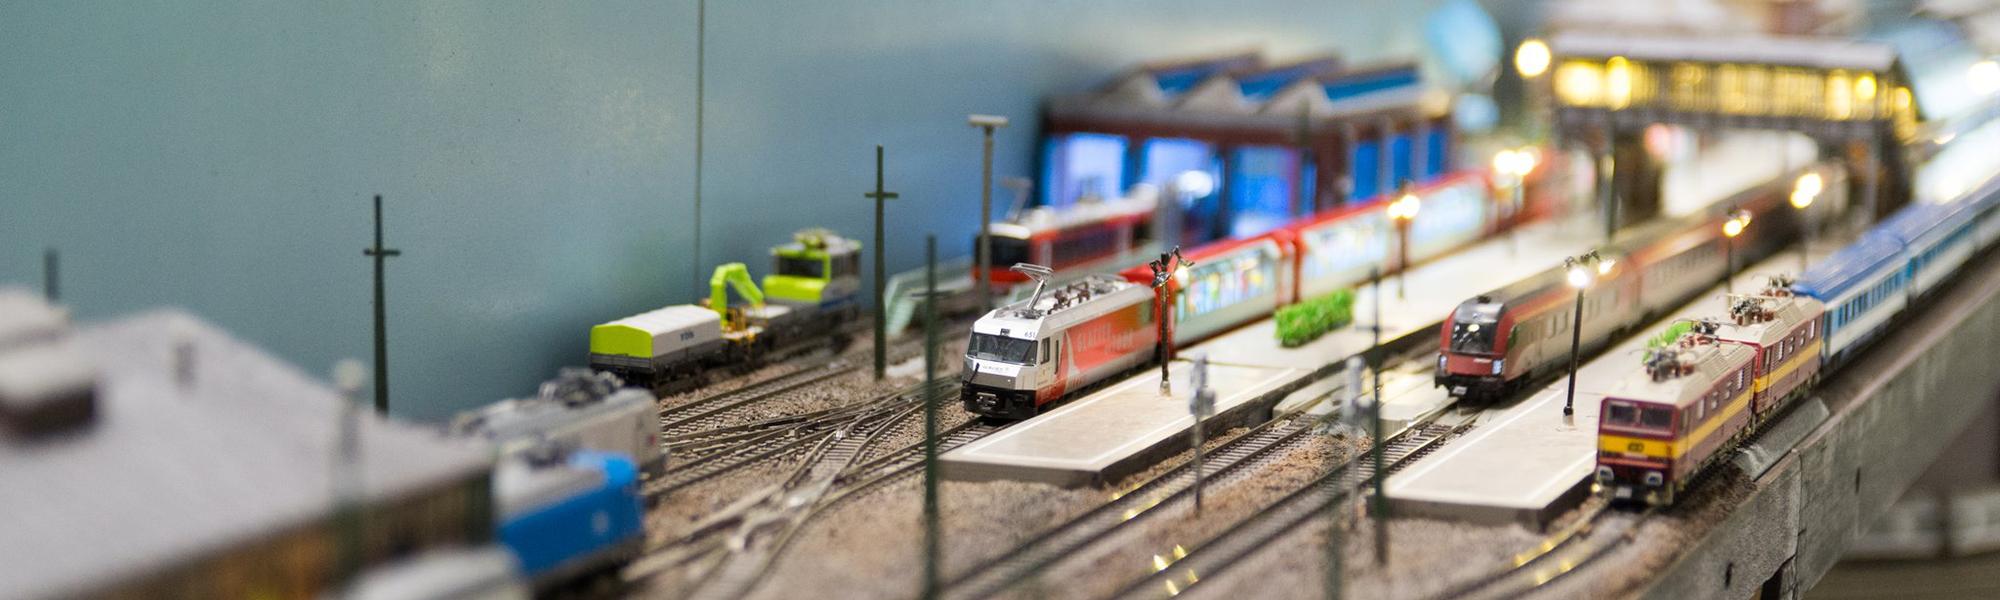 KH Train Factory